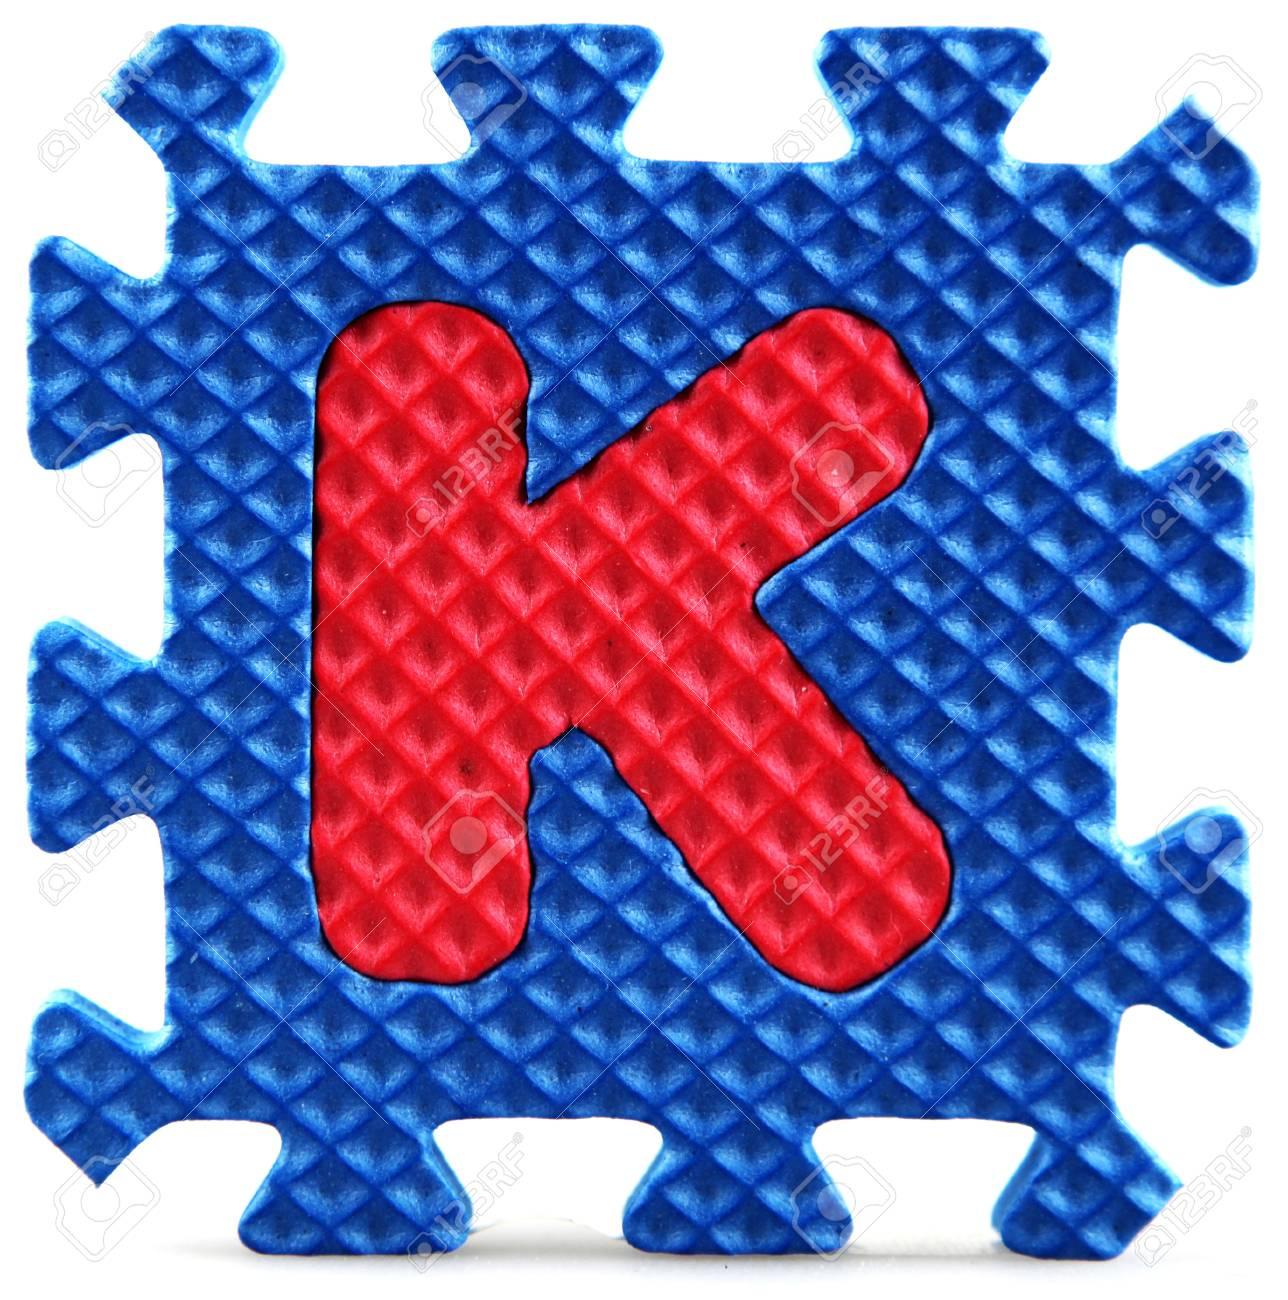 Alphabet puzzle pieces on white background Stock Photo - 9758948